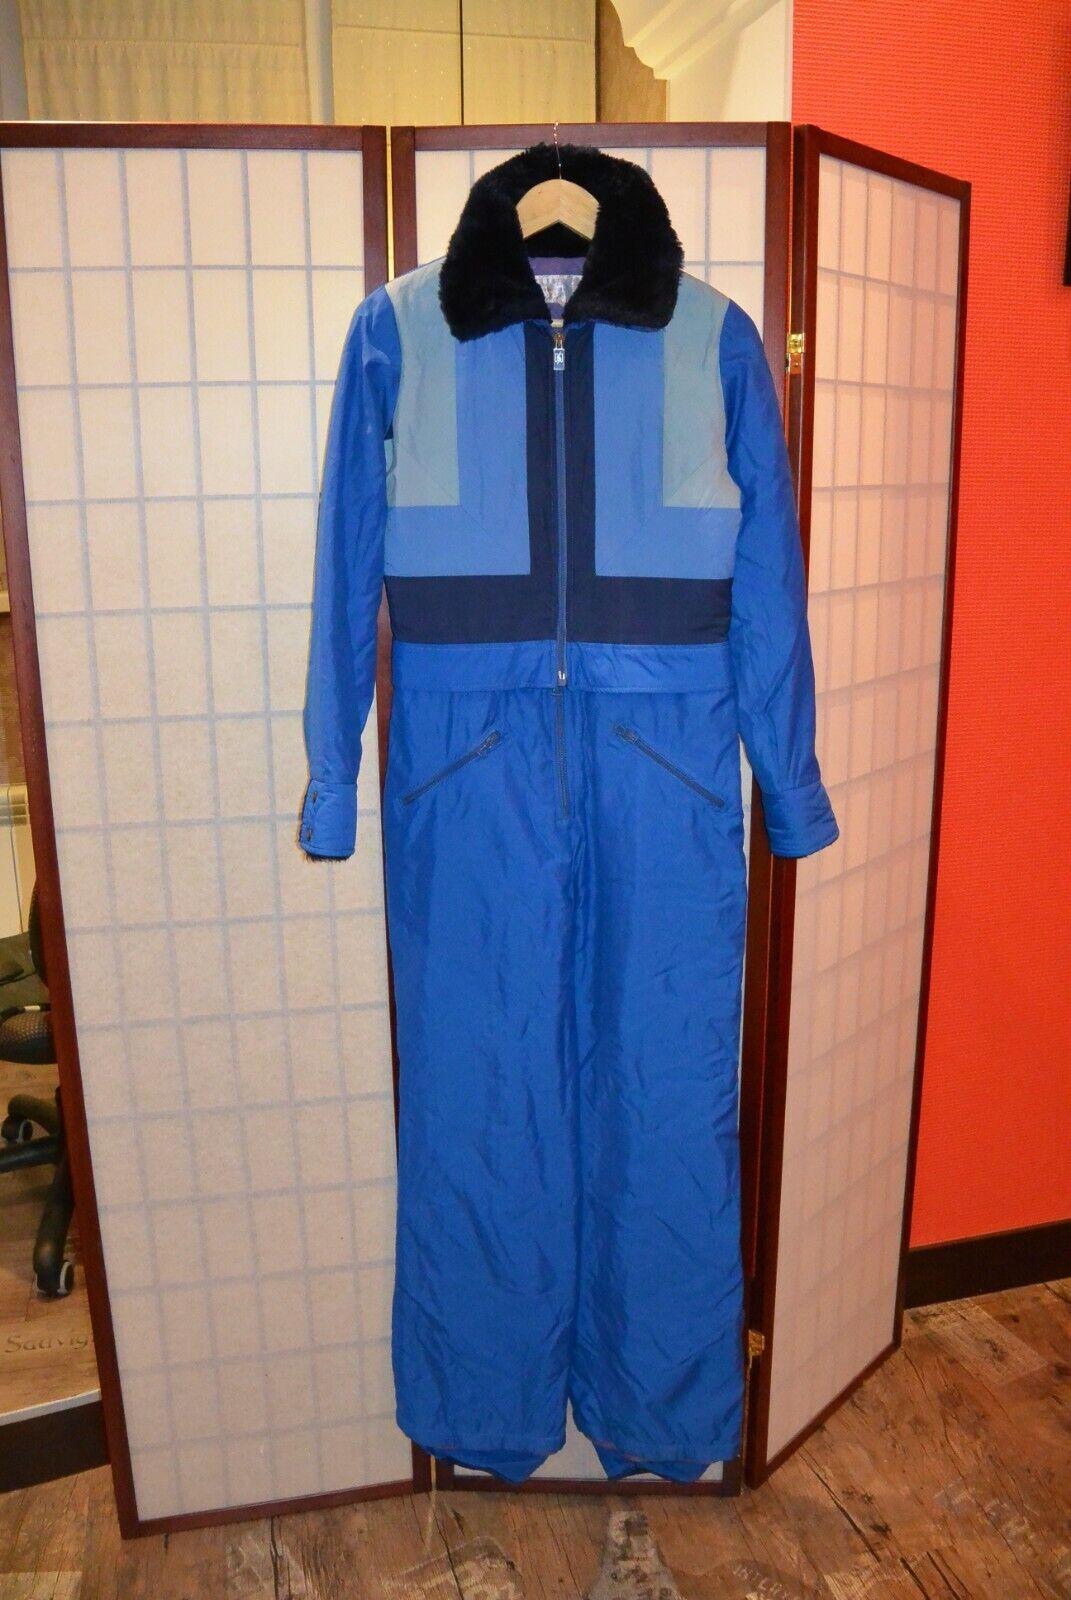 Skimer Blau  retro vintage Skisuit France Paris  42